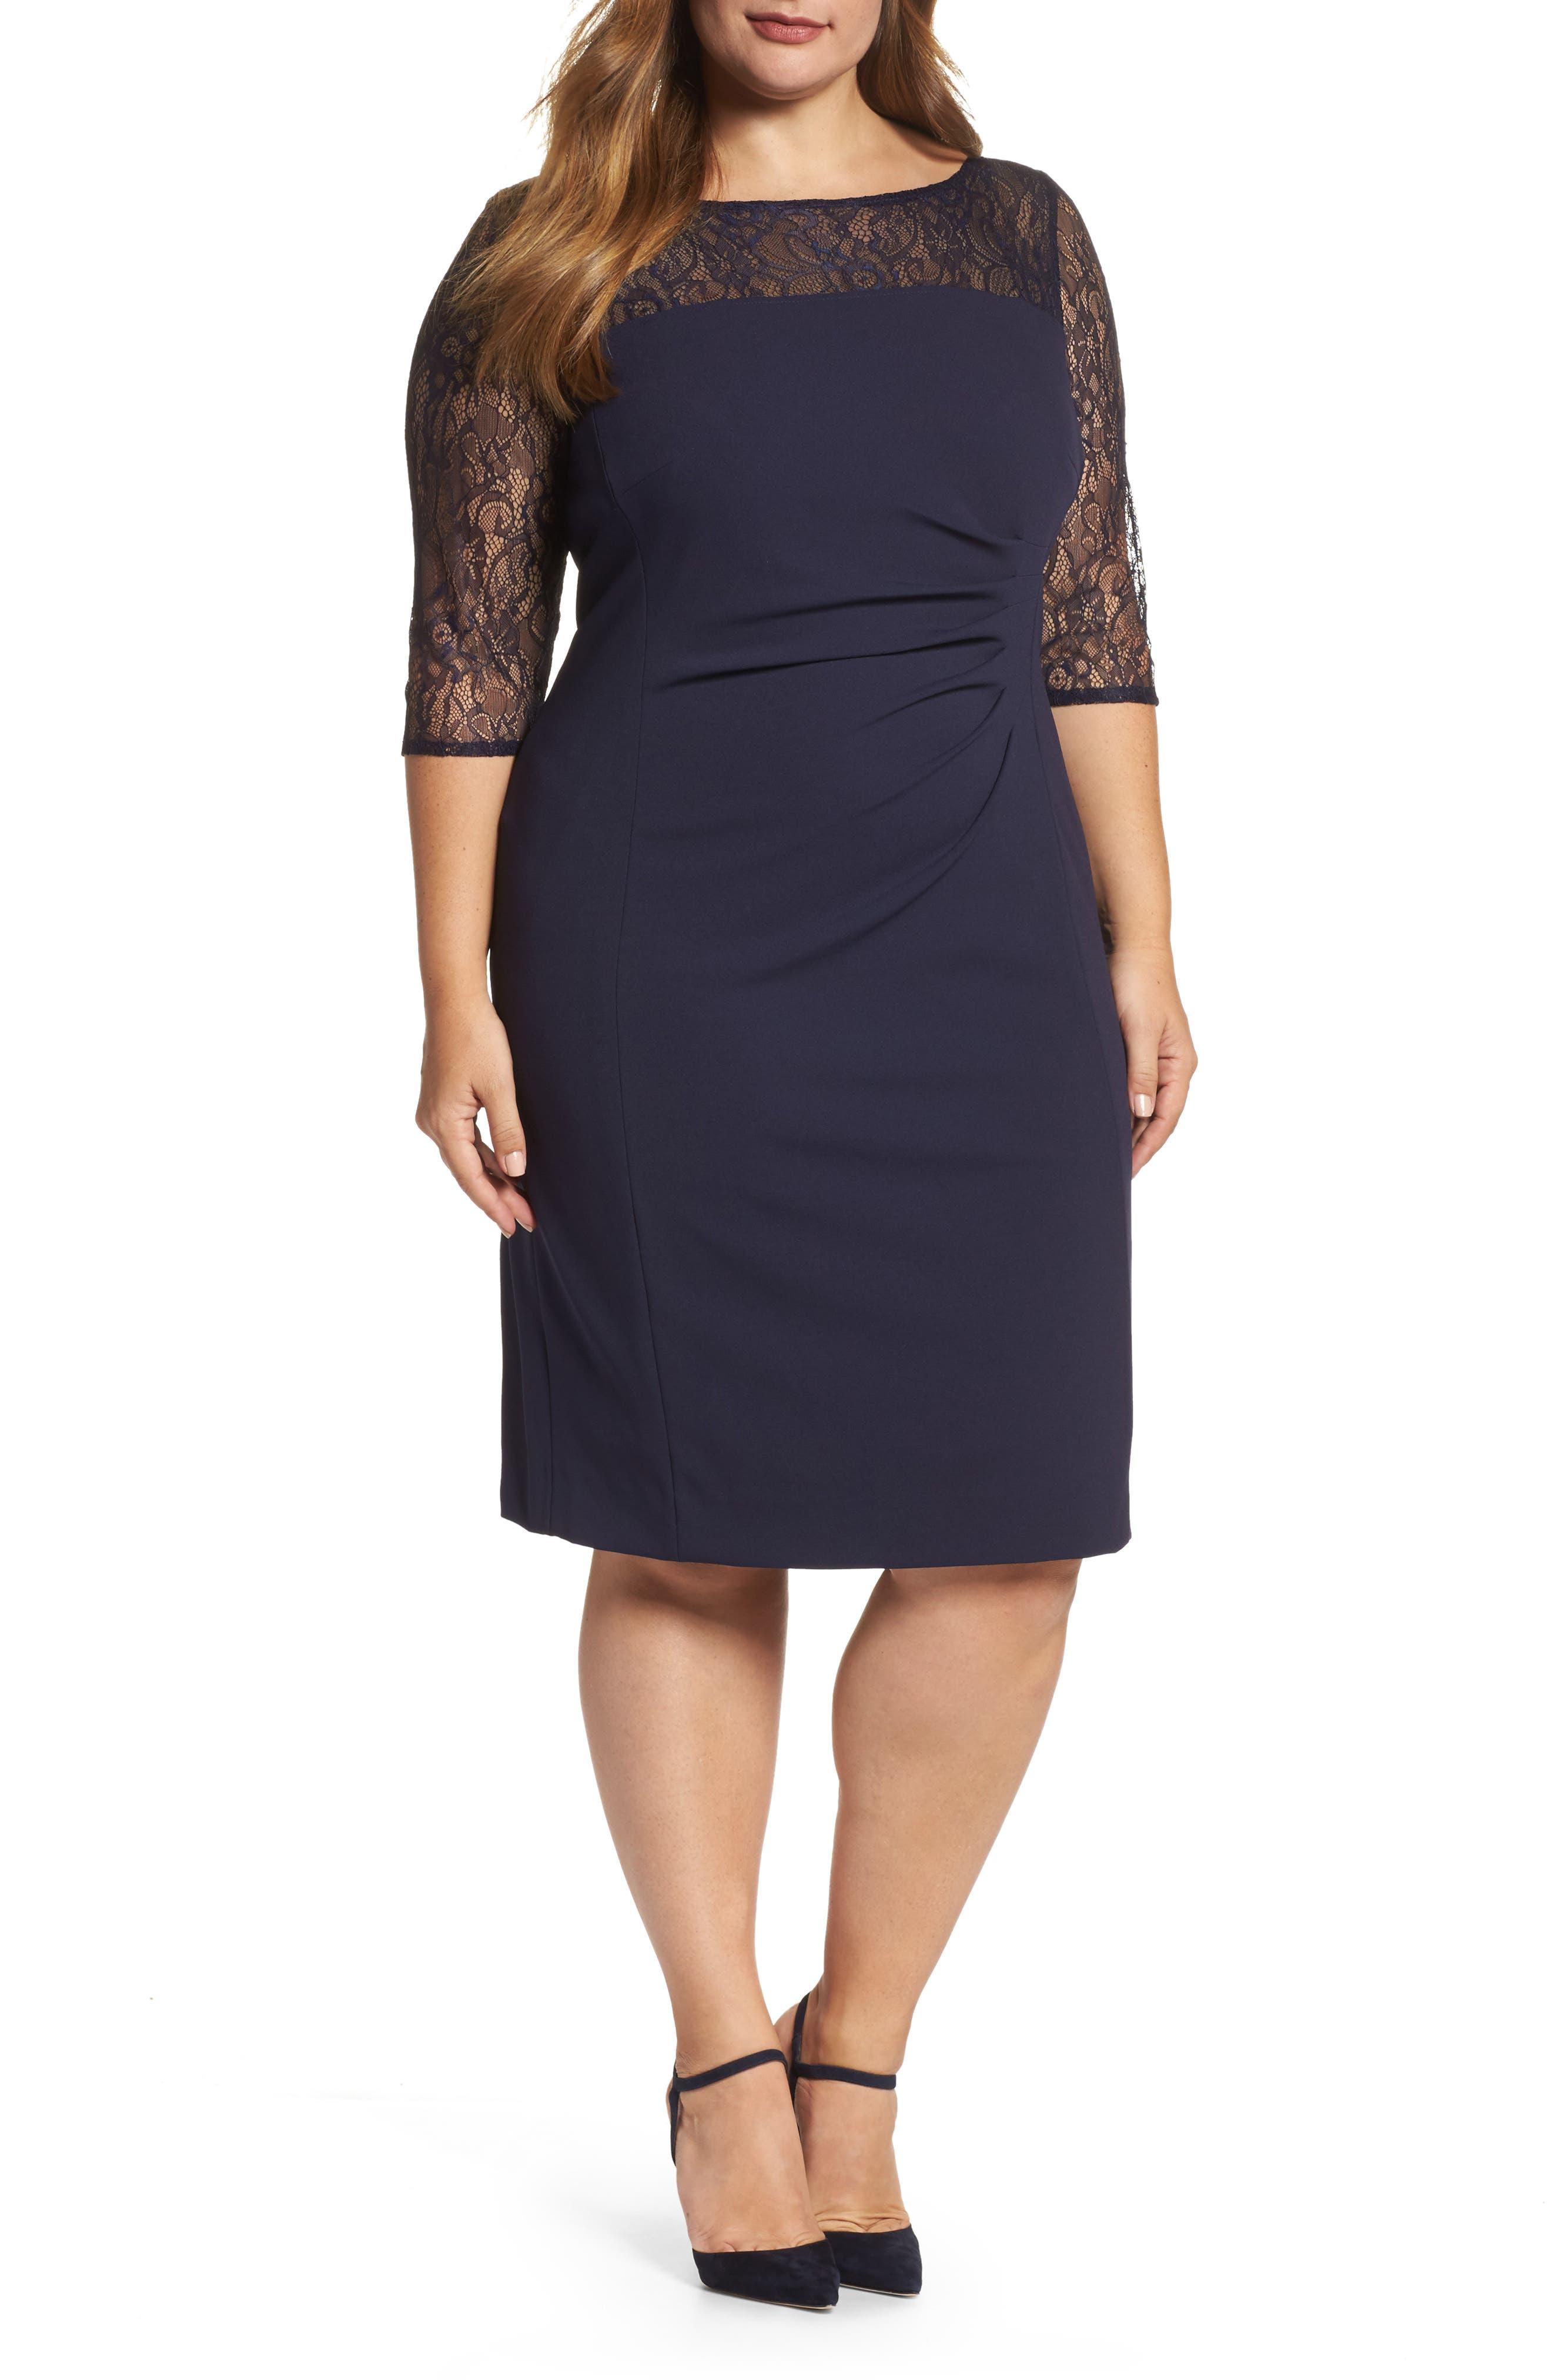 Tahari Lace Illusion Sheath Dress (Plus Size)